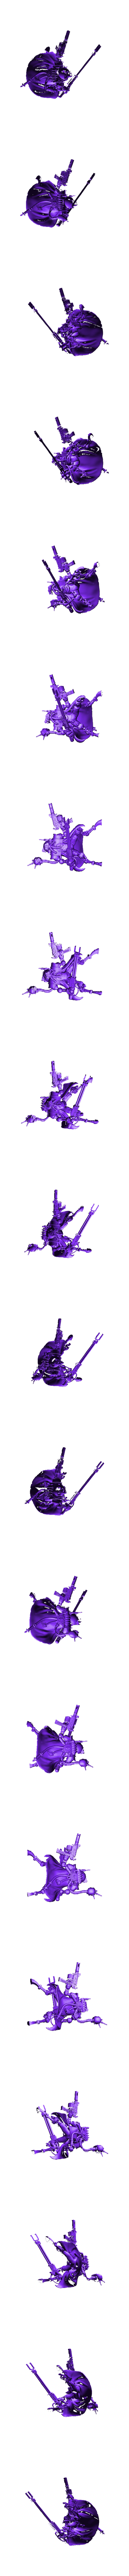 Princeps_whole.stl Download free STL file Martian Leader of Stealthy Intruders • 3D printing template, ErikTheHeretek